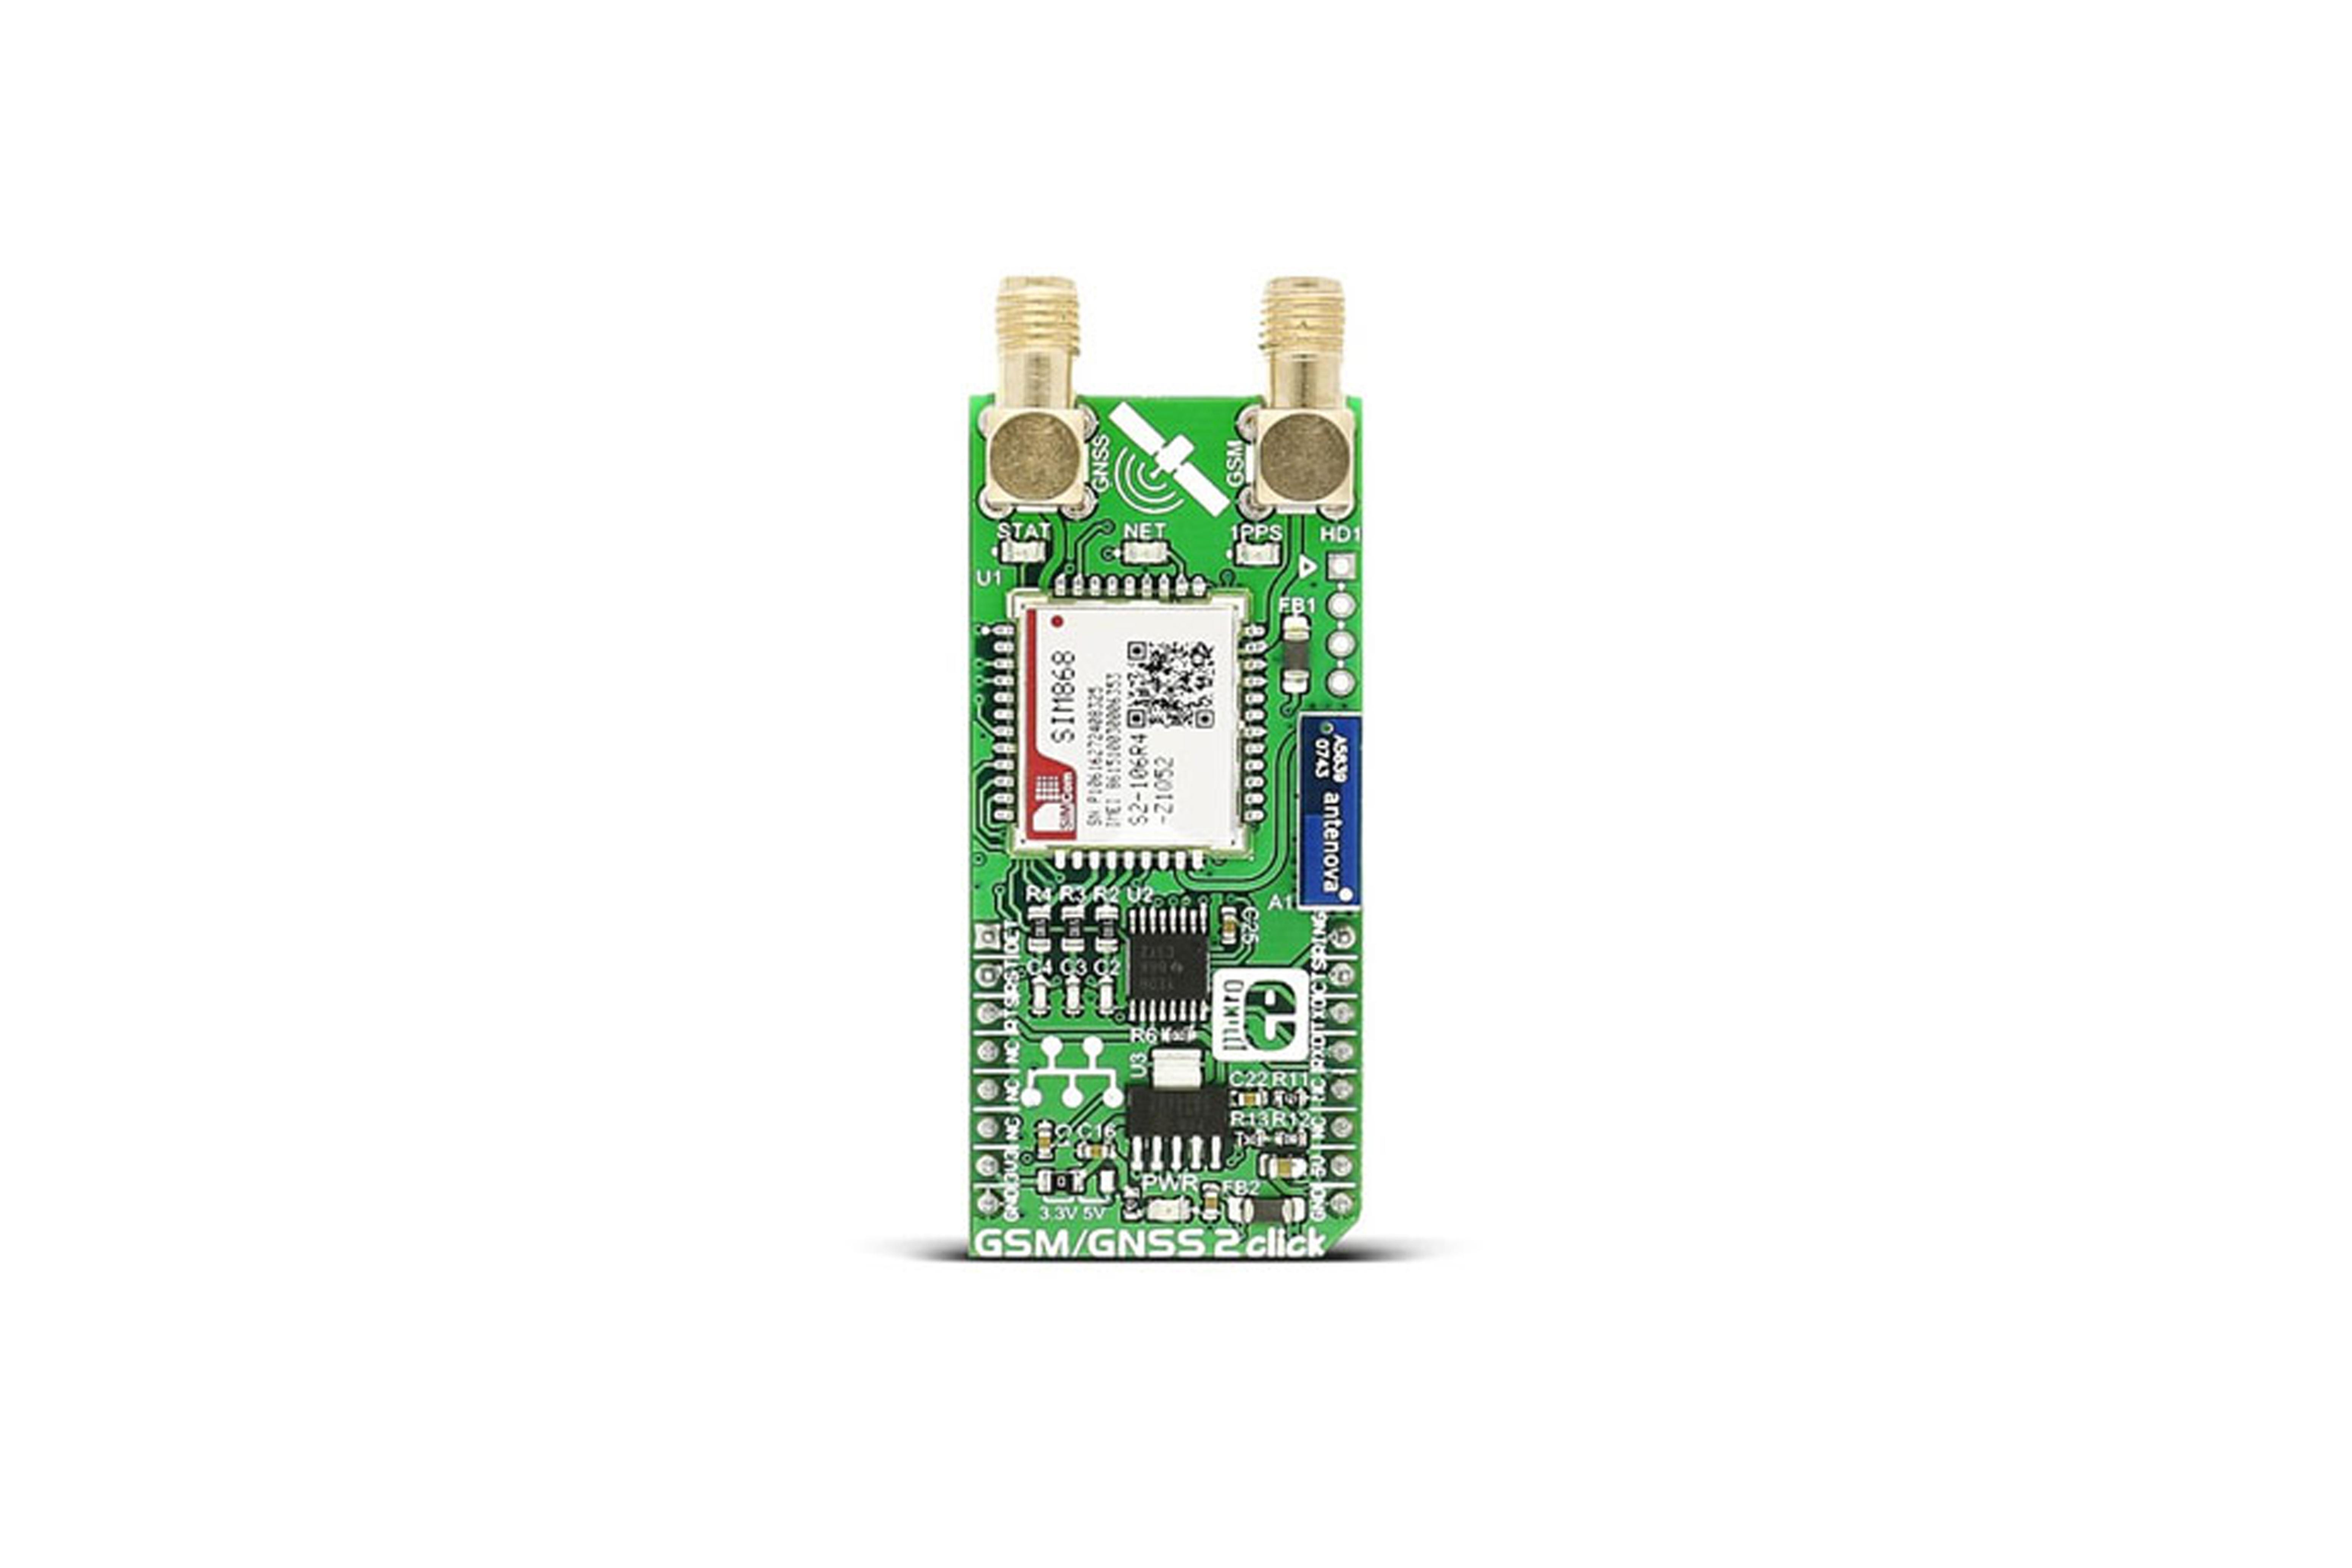 CLICK BOARD GSM/GNSS 2, MIKROE-2440